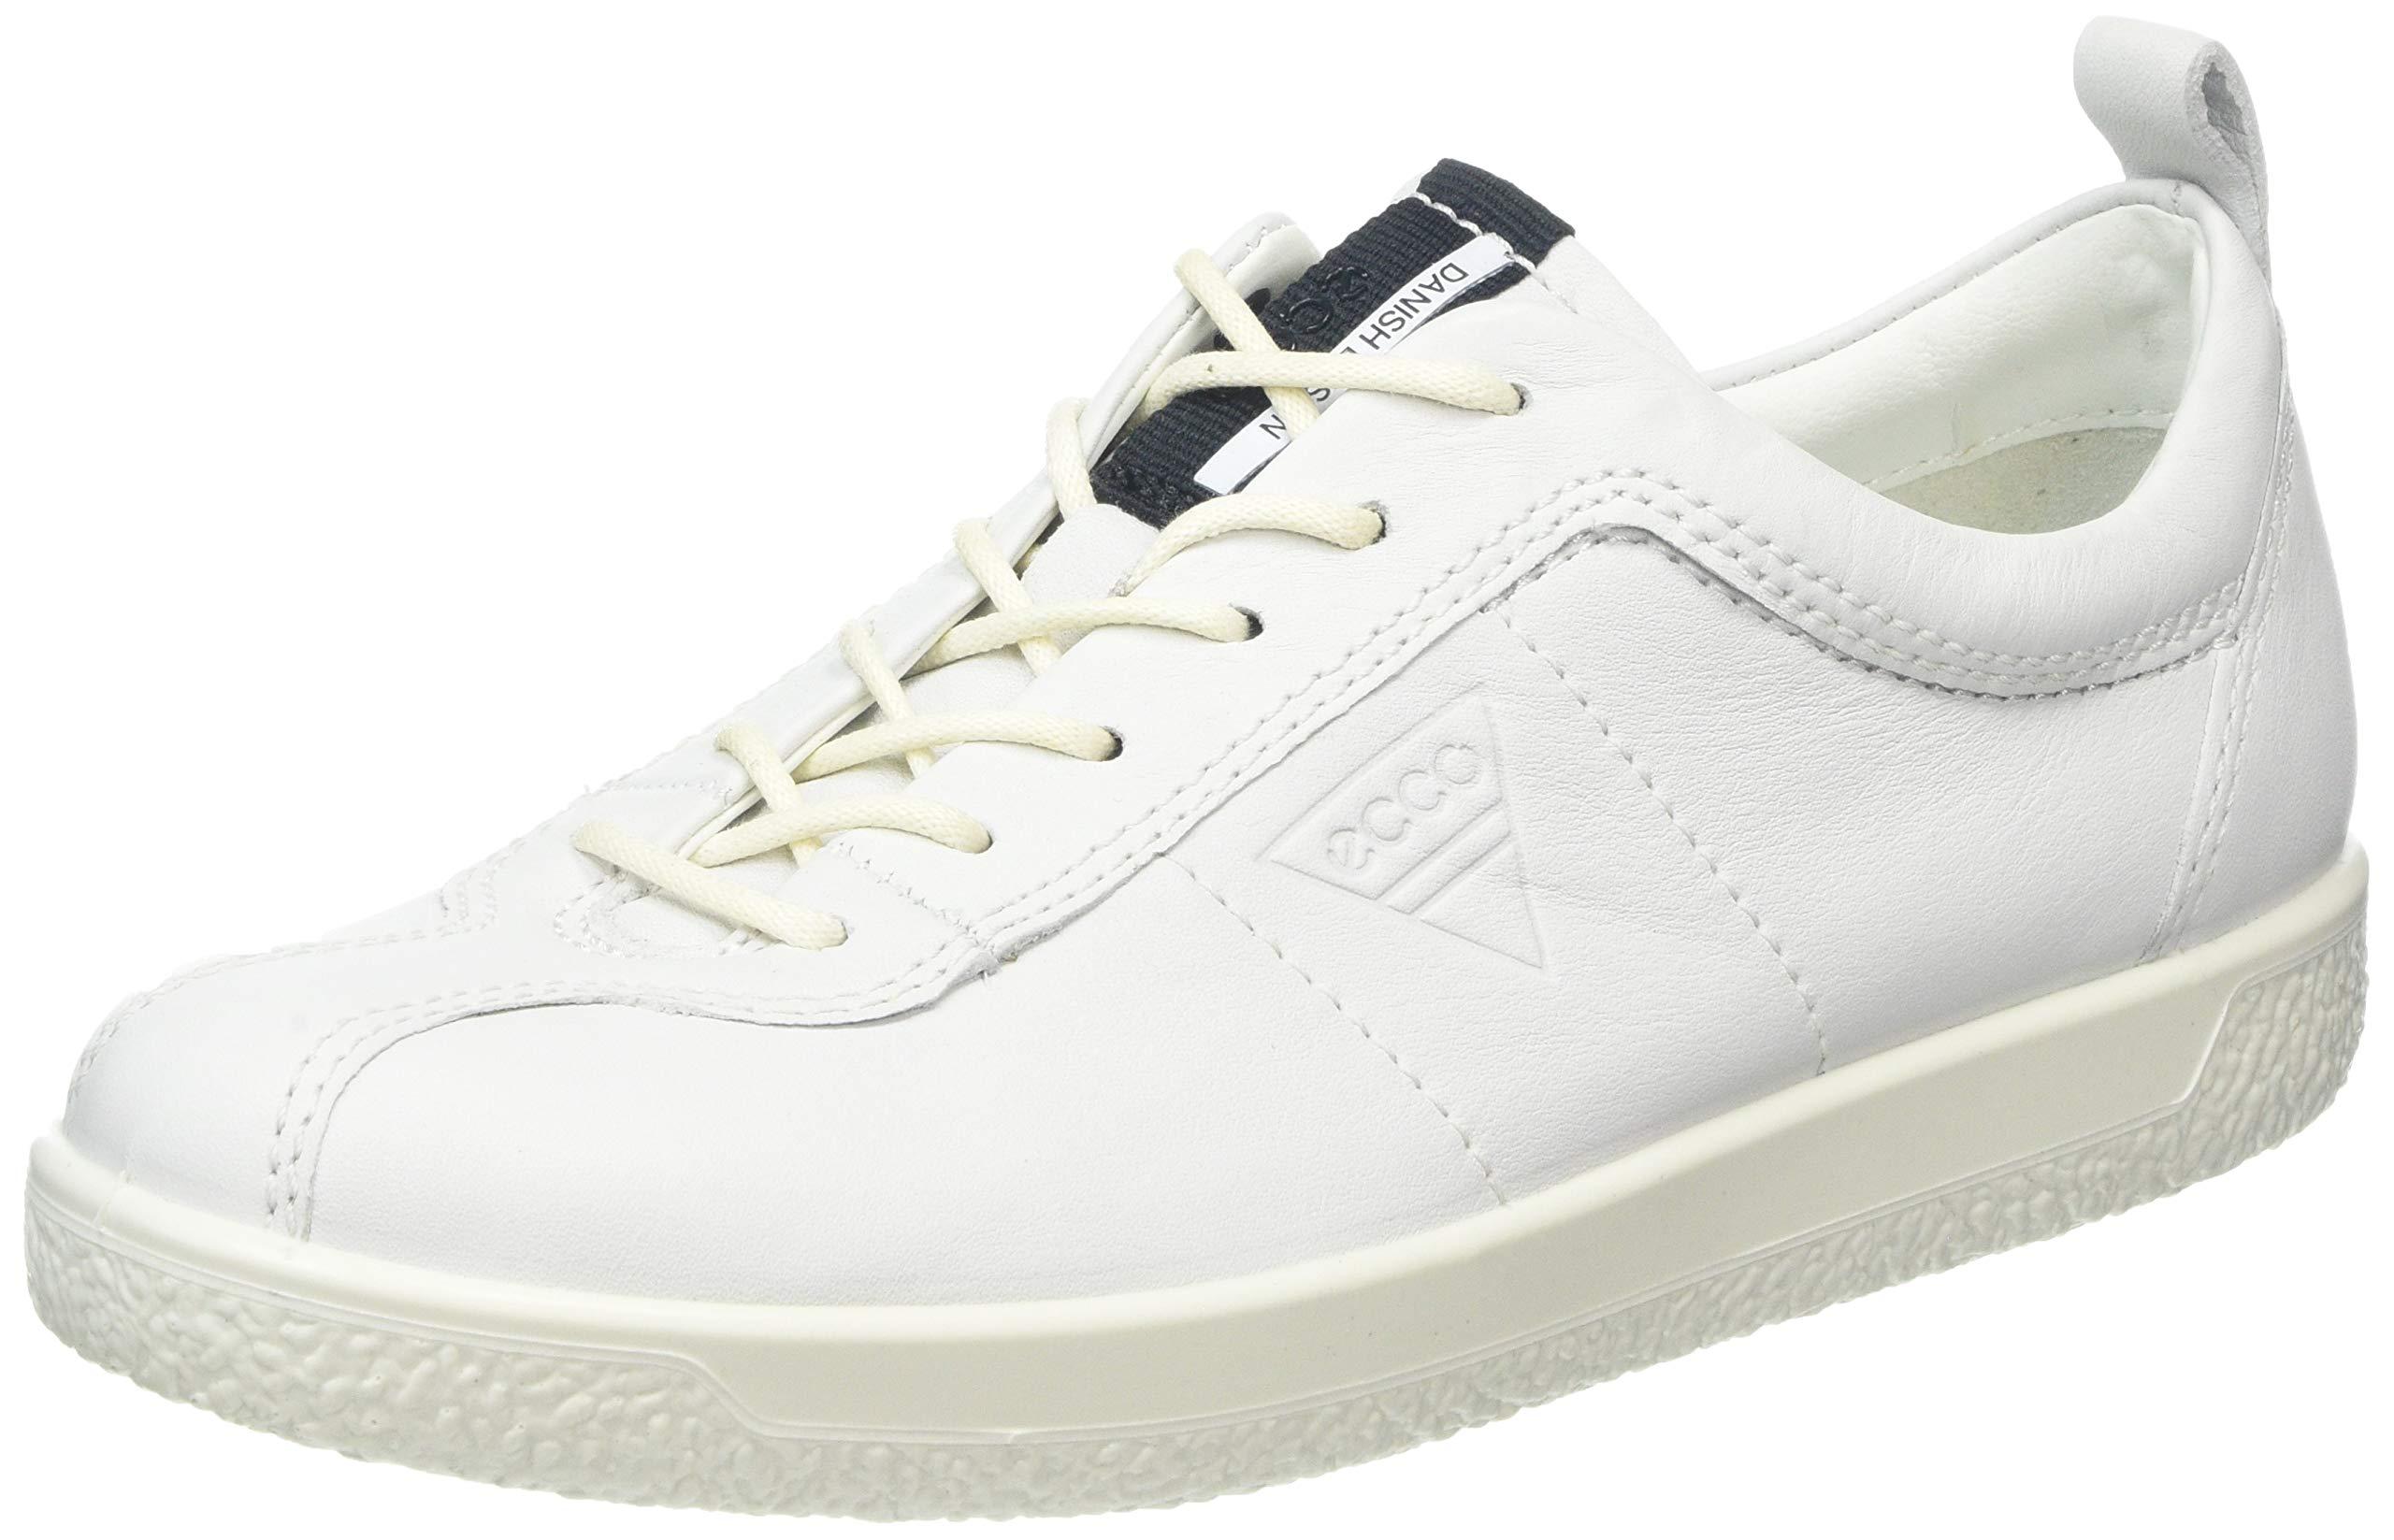 Ecco Eu 1Sneakers Basses Femmewhite41 Soft JKcTlF1